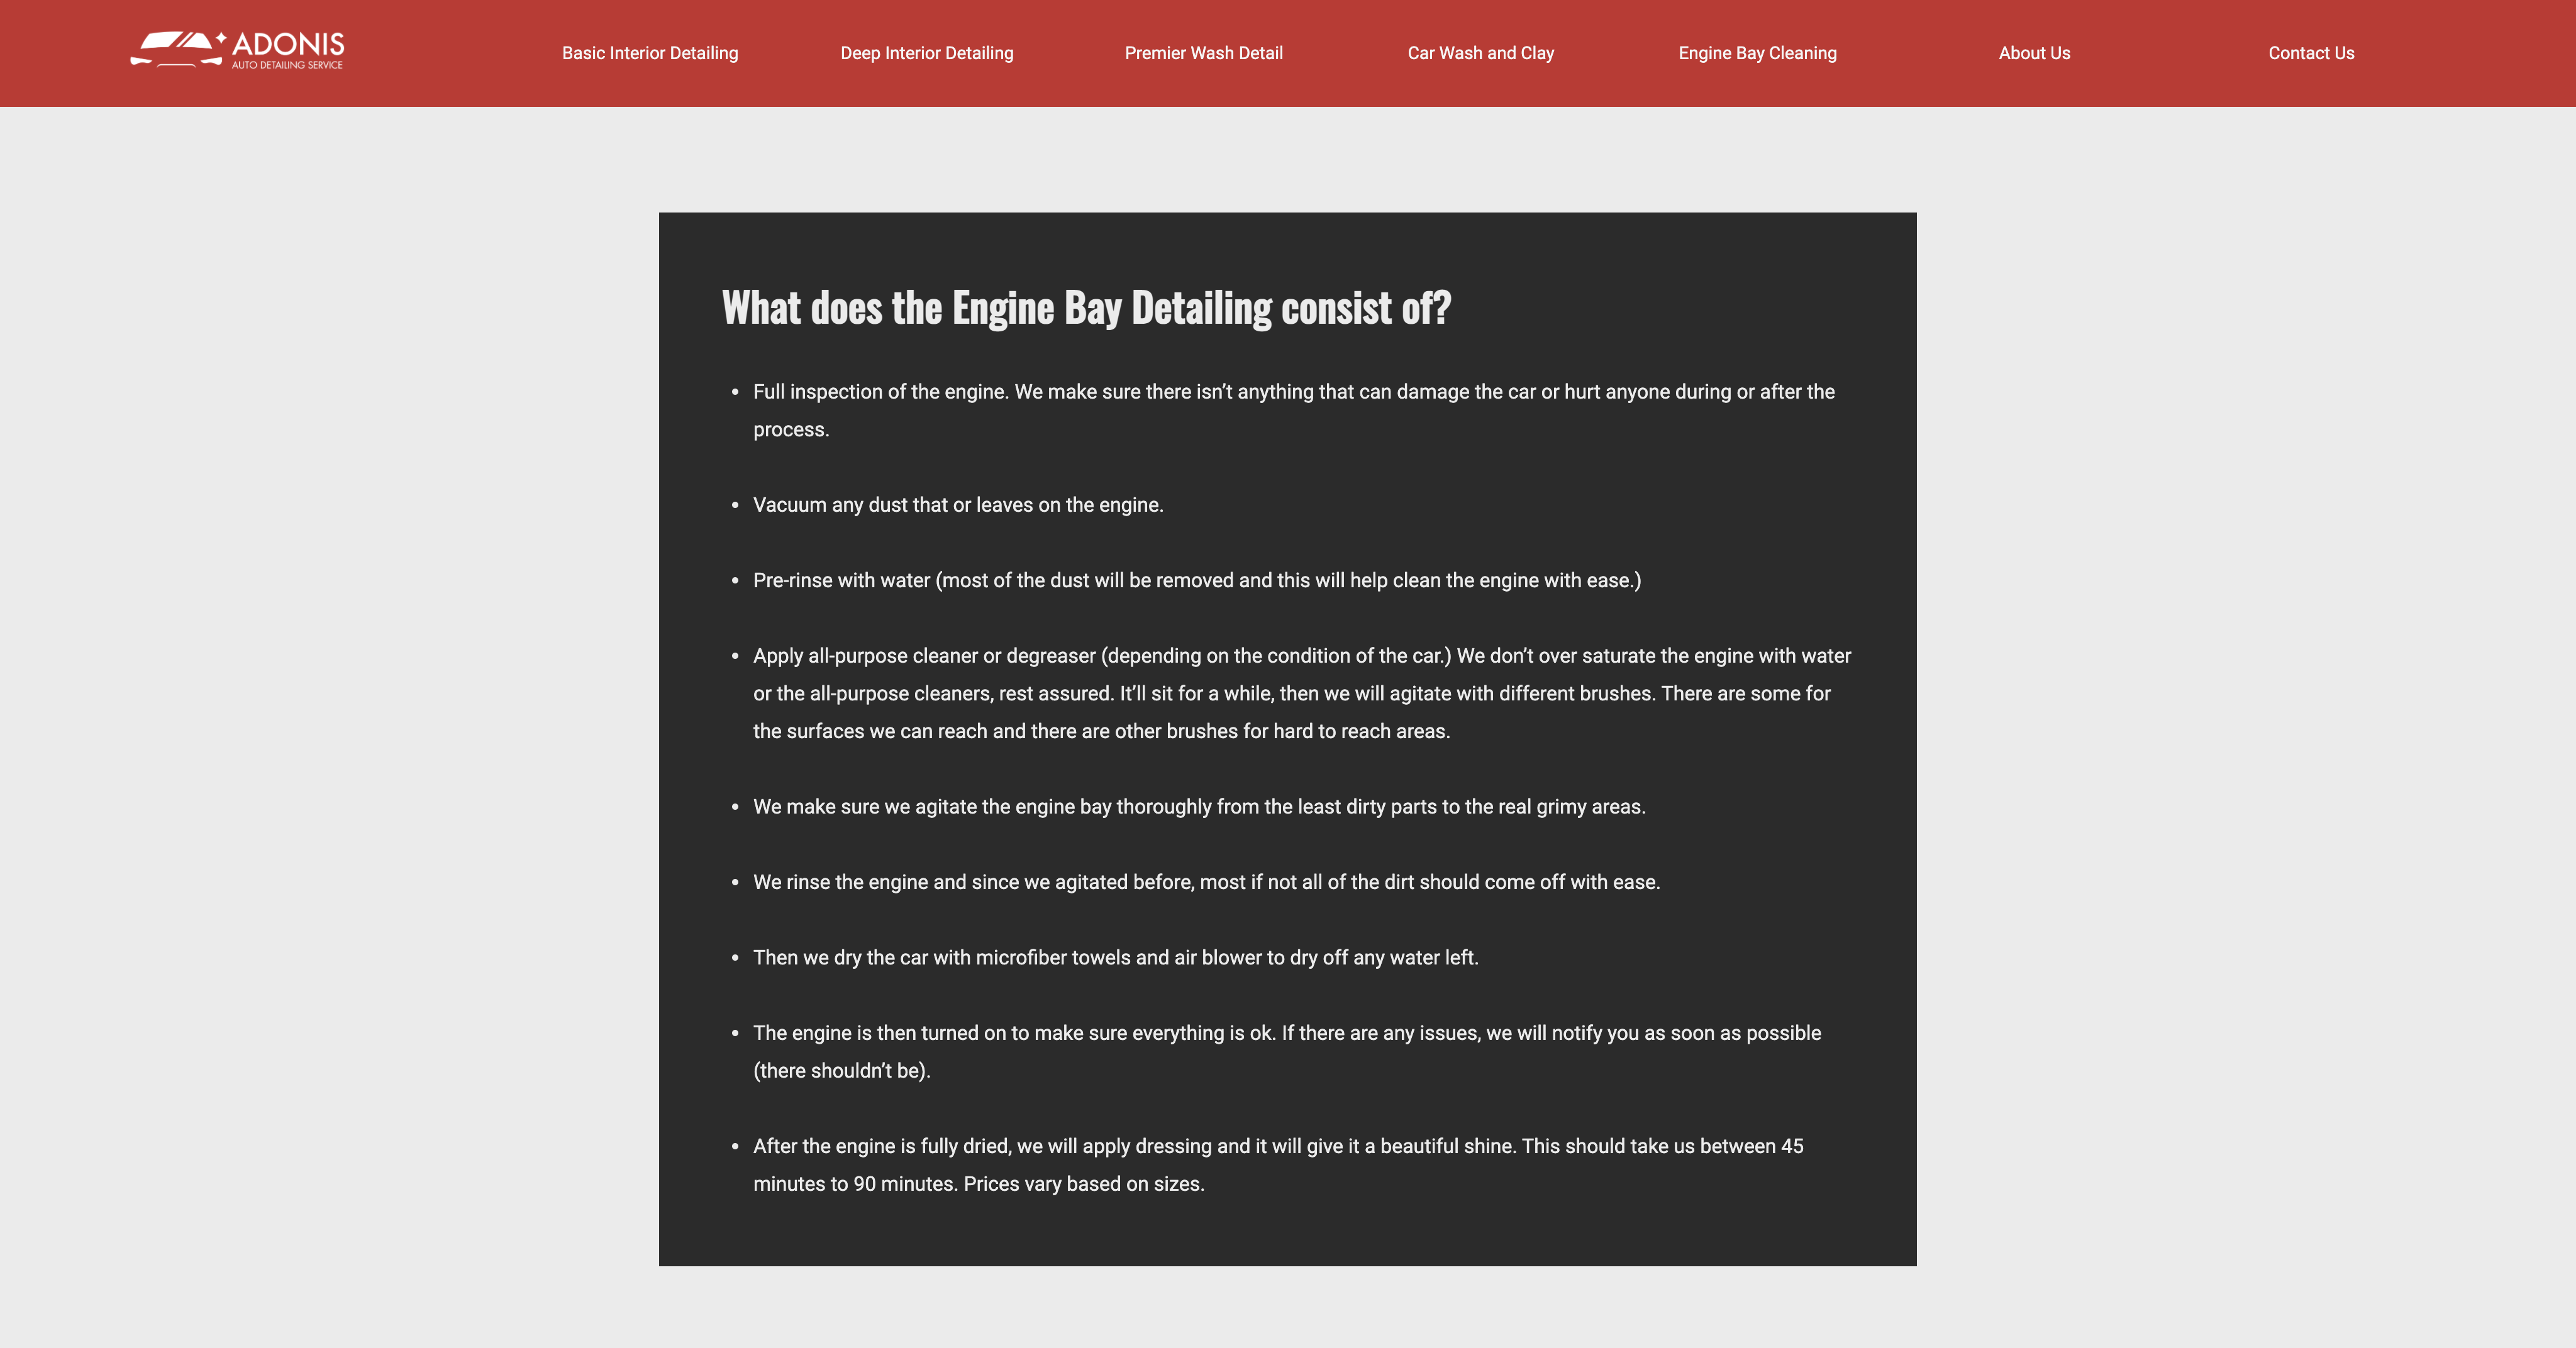 Adonis website service info